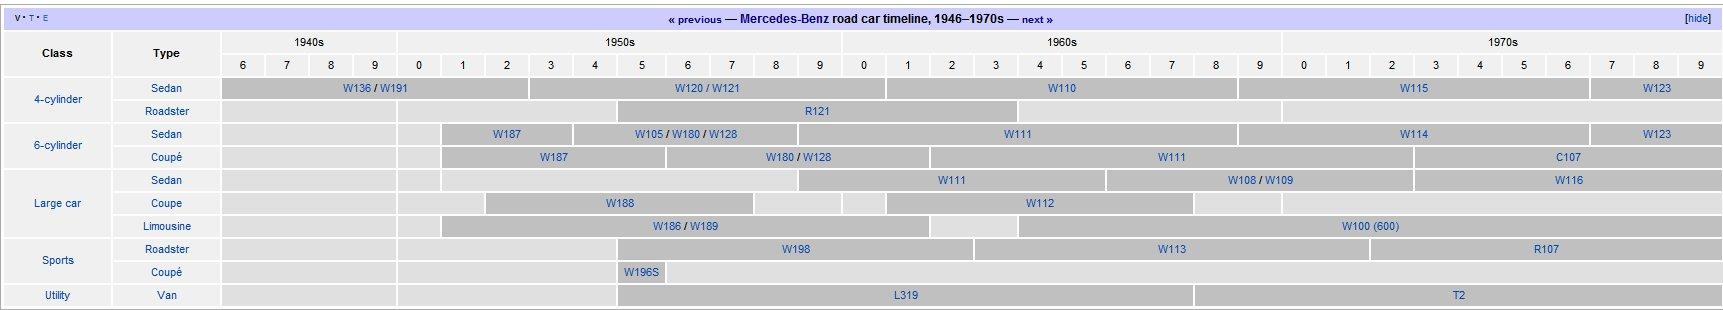 gamme-mercedes-1946-1979.jpg